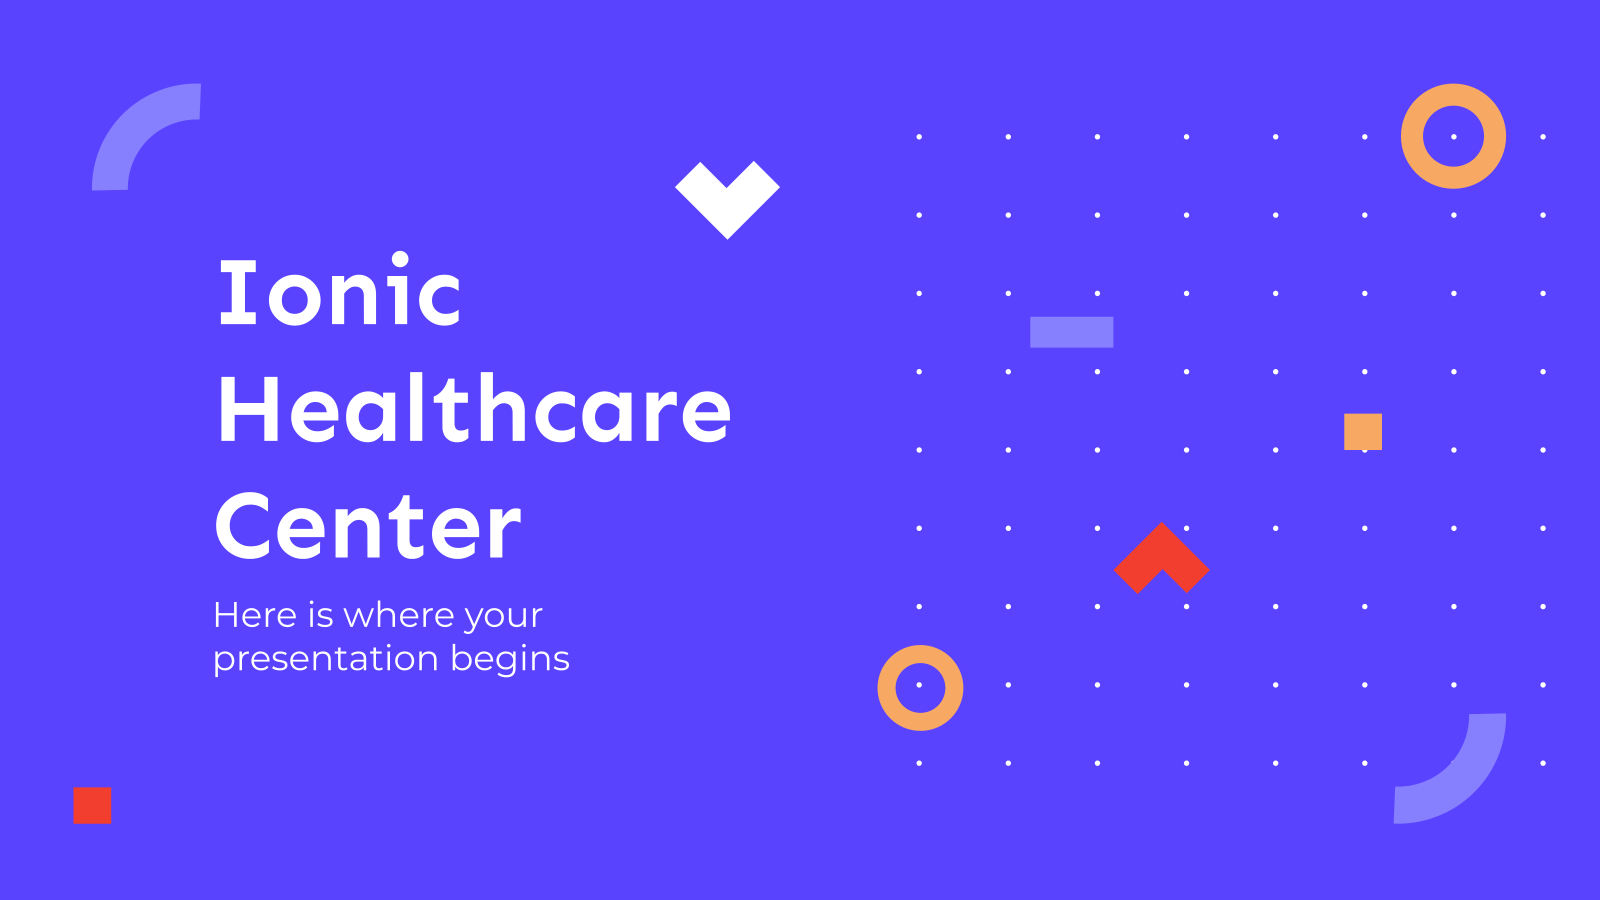 Ionic Healthcare Center presentation template